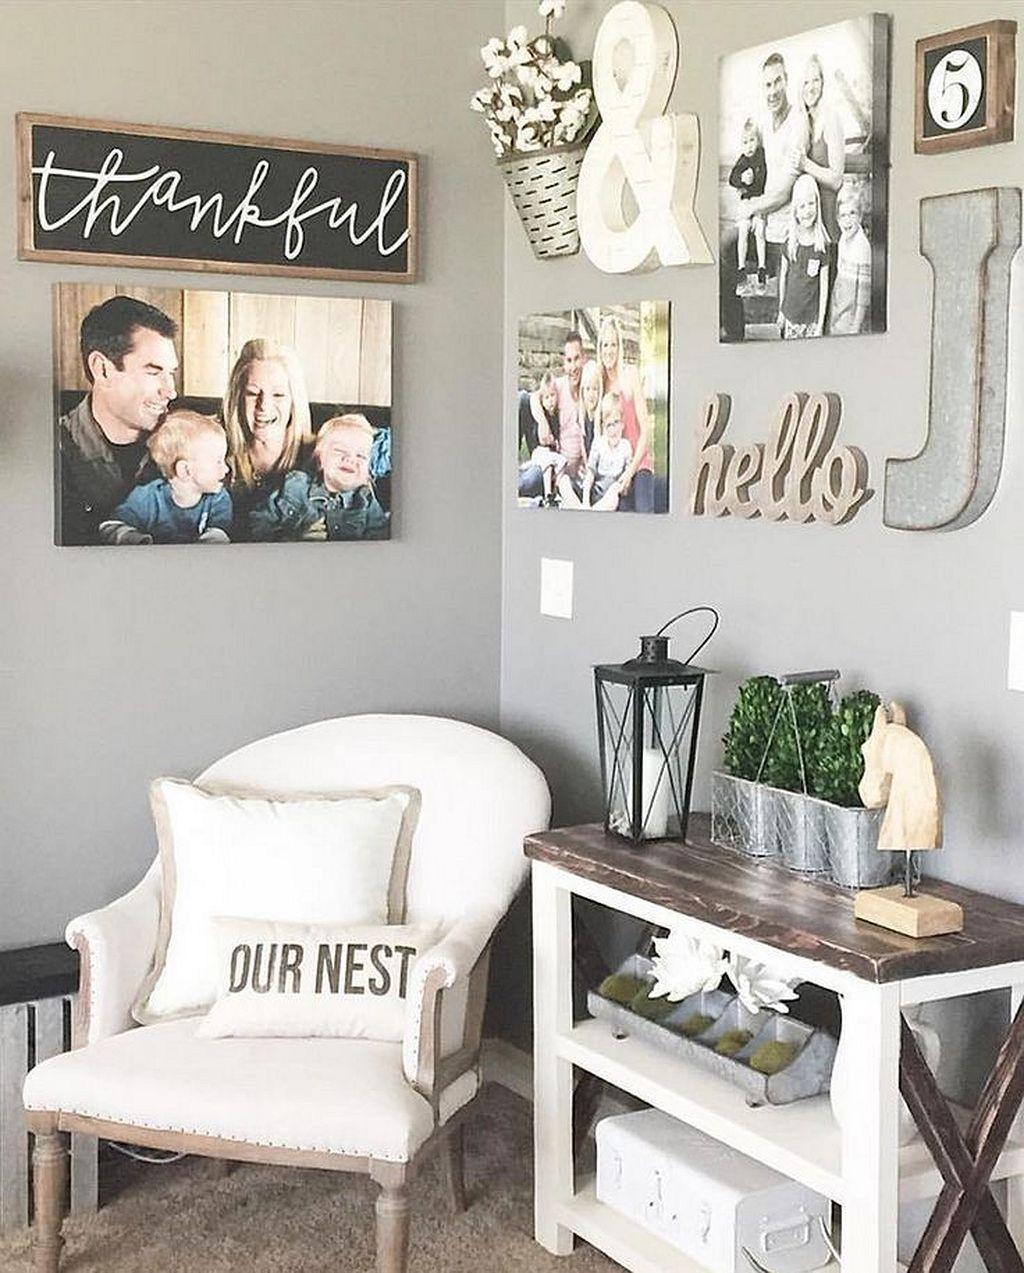 Stunning Rustic Farmhouse Style Living Room Design Ideas 4 | Rustic ...